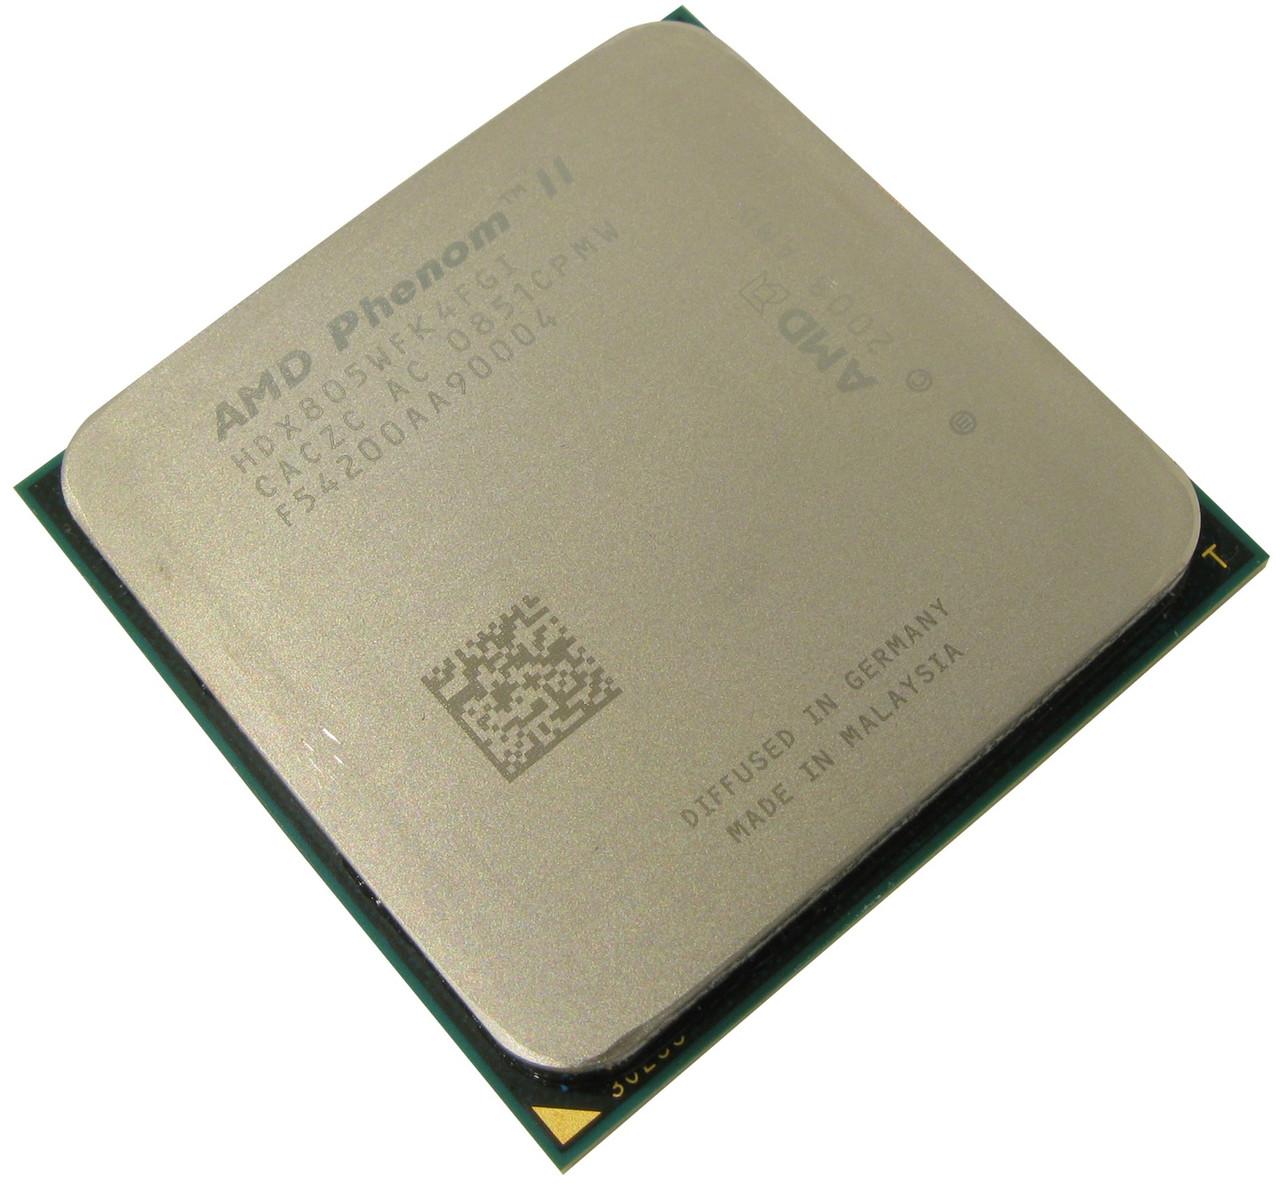 Процессор AMD Phenom II X4 805 2.5 Hz БУ